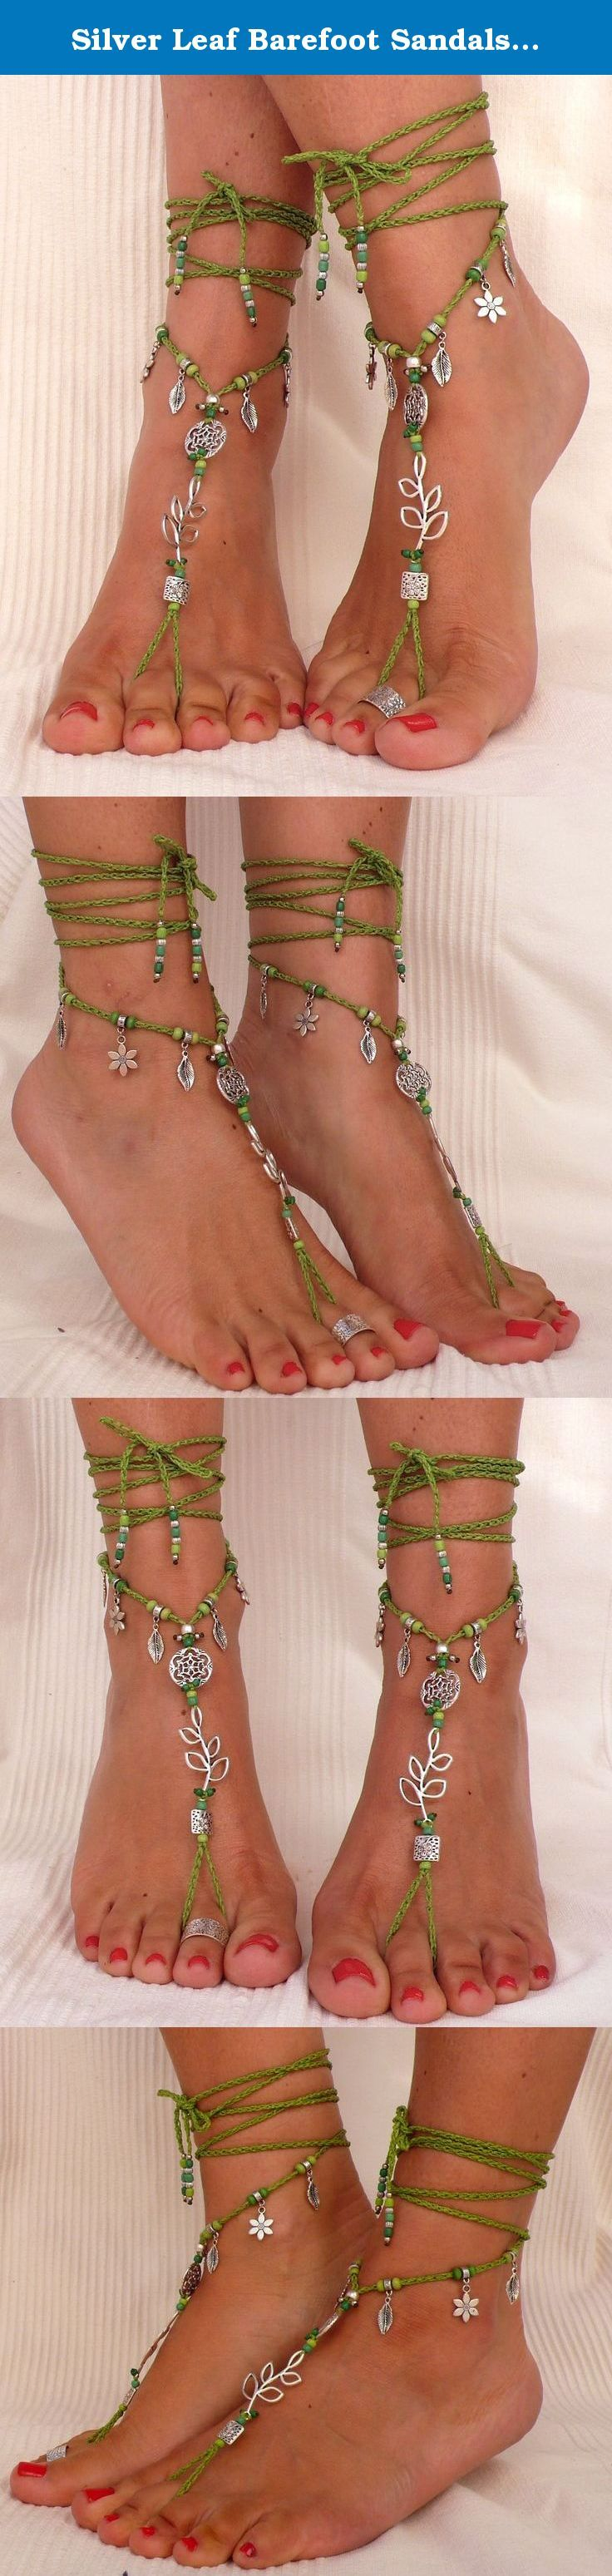 Silver Leaf Barefoot Sandals greenFoot JewelryHippie